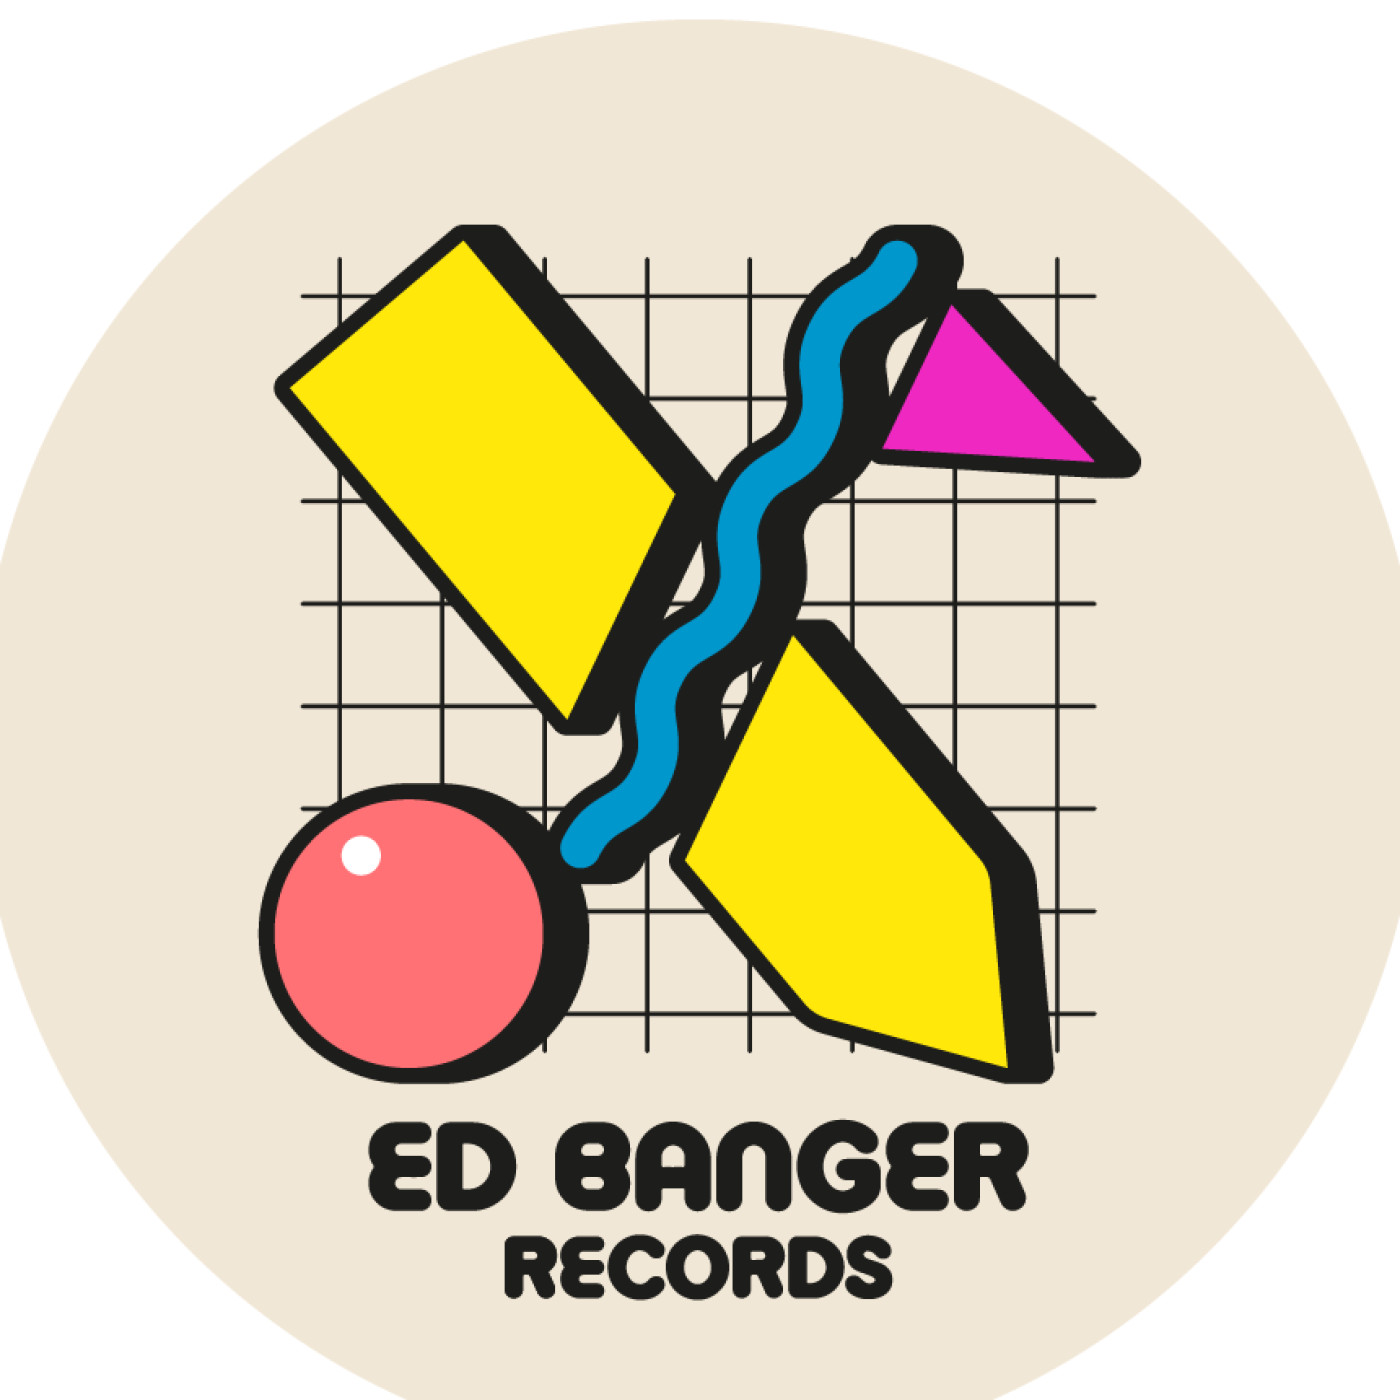 La music story du jour : Ed Banger Records